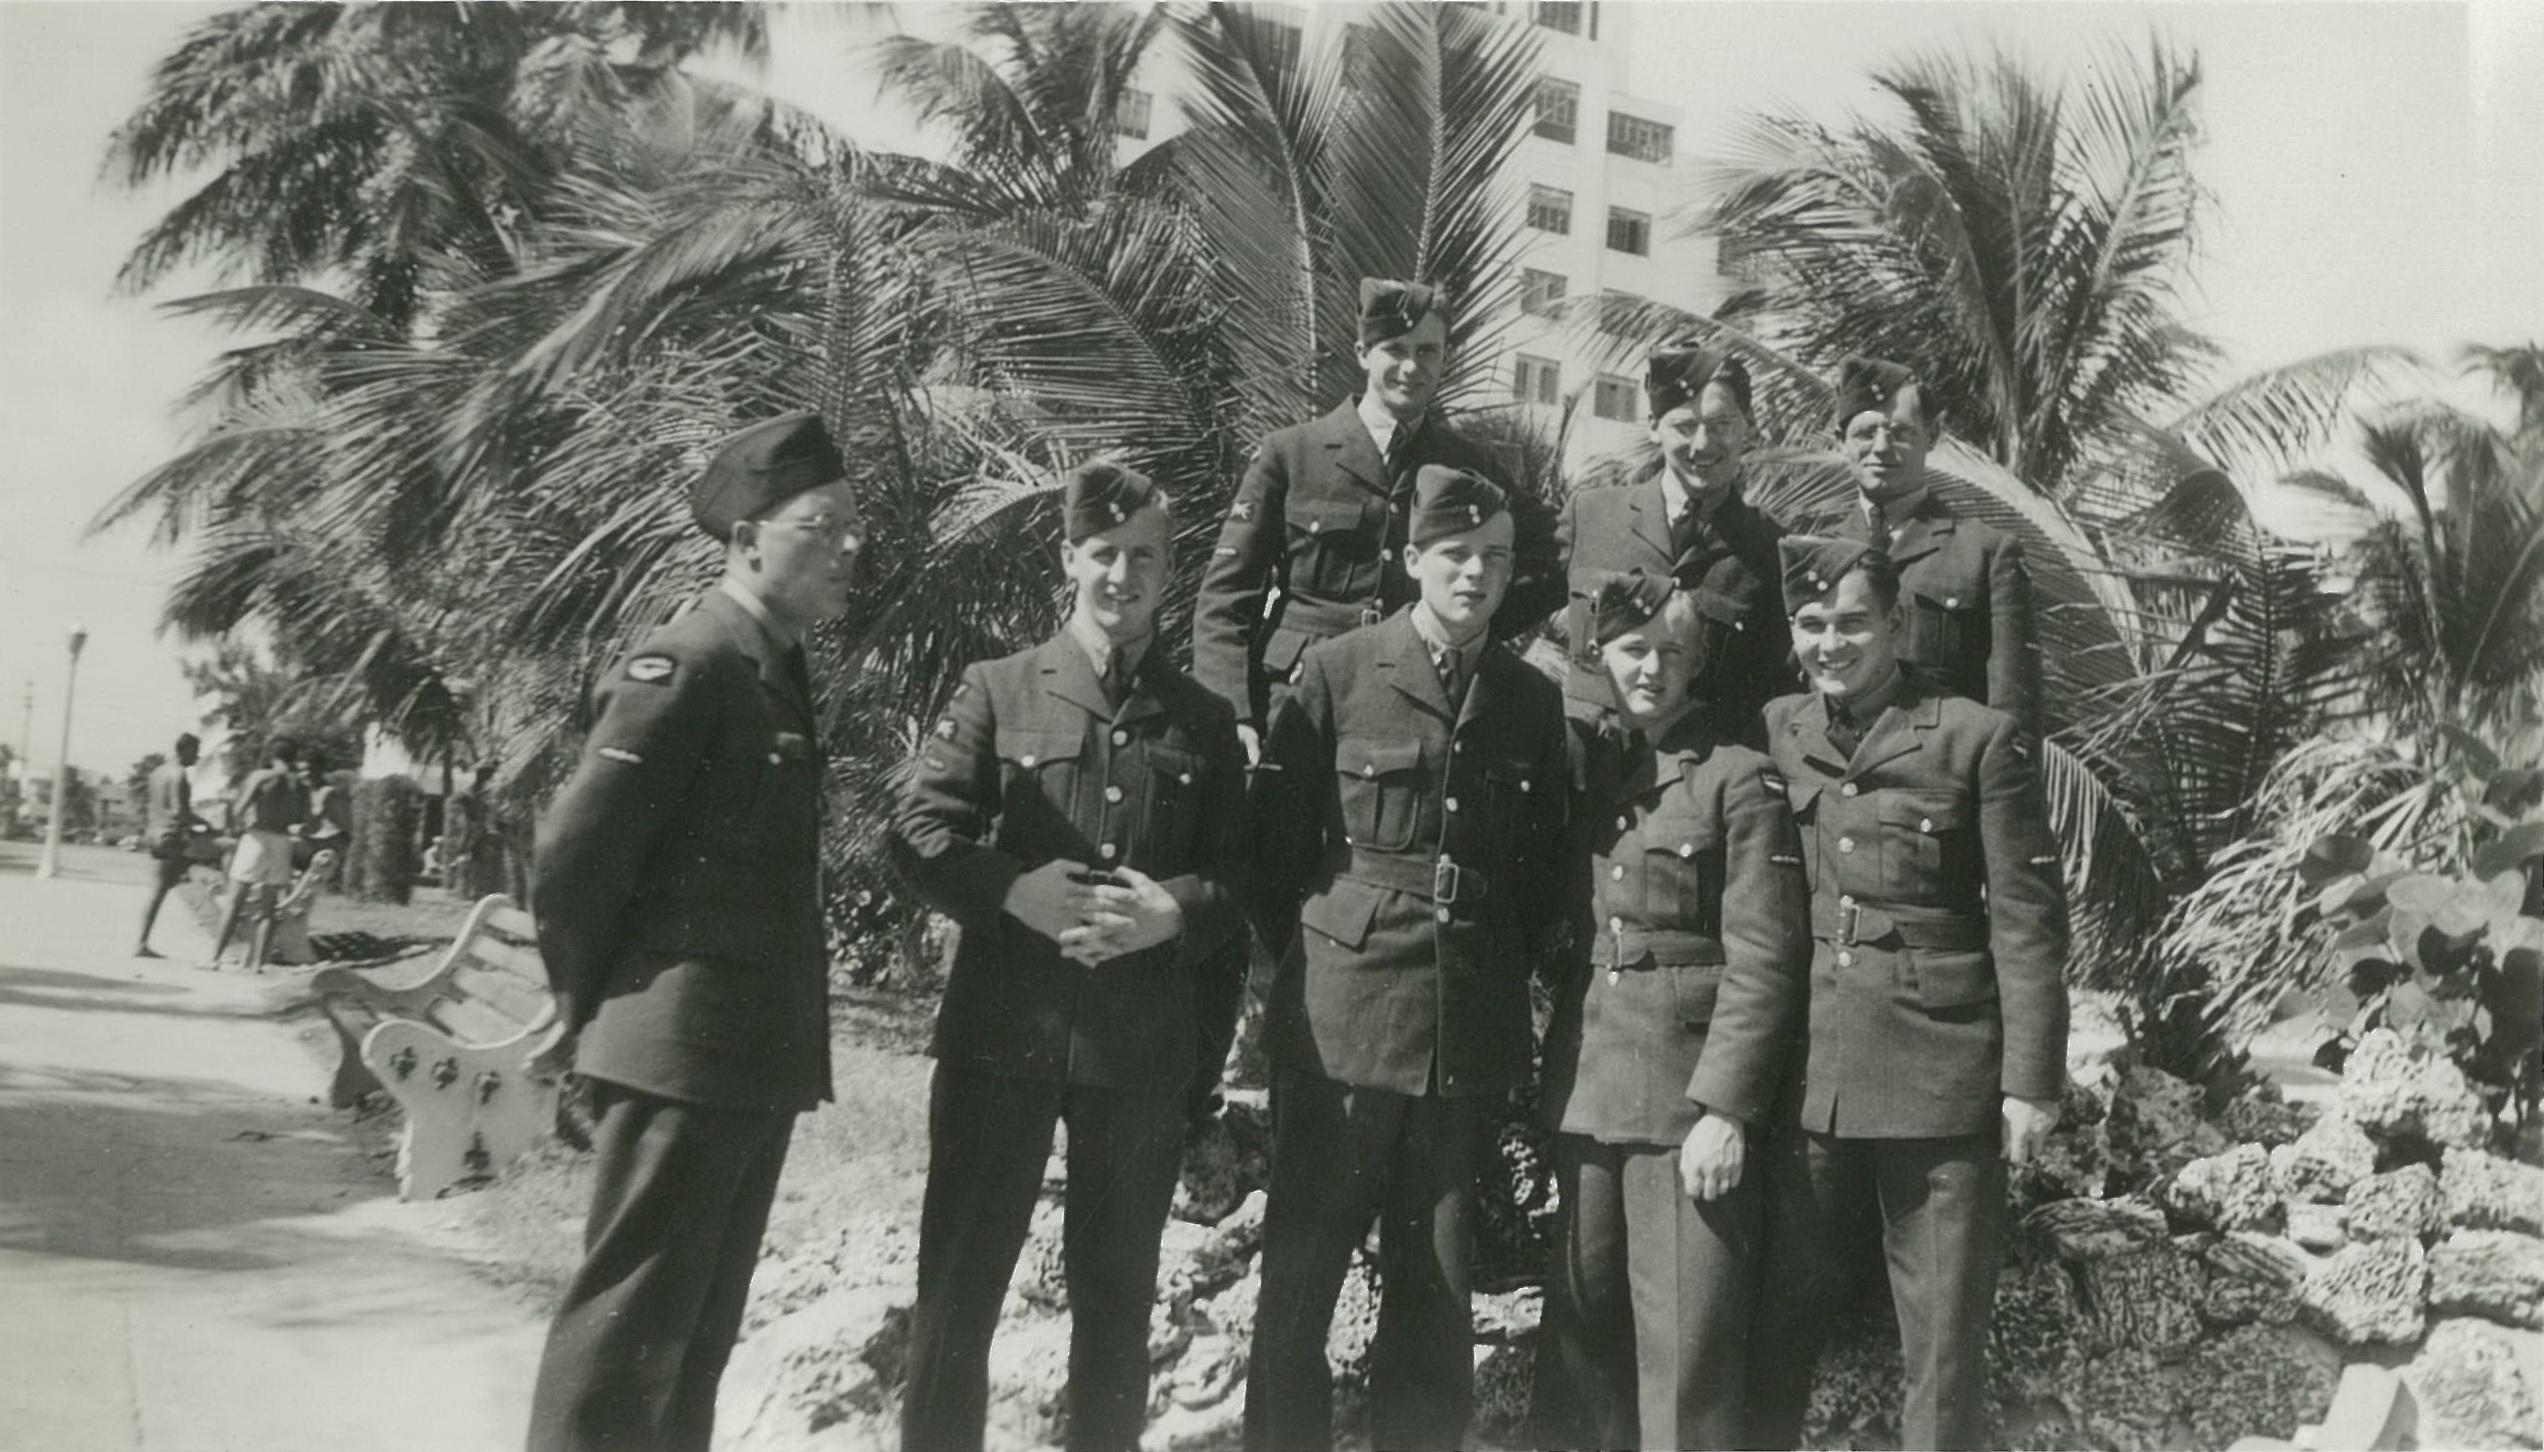 Nov 3rd, 1943